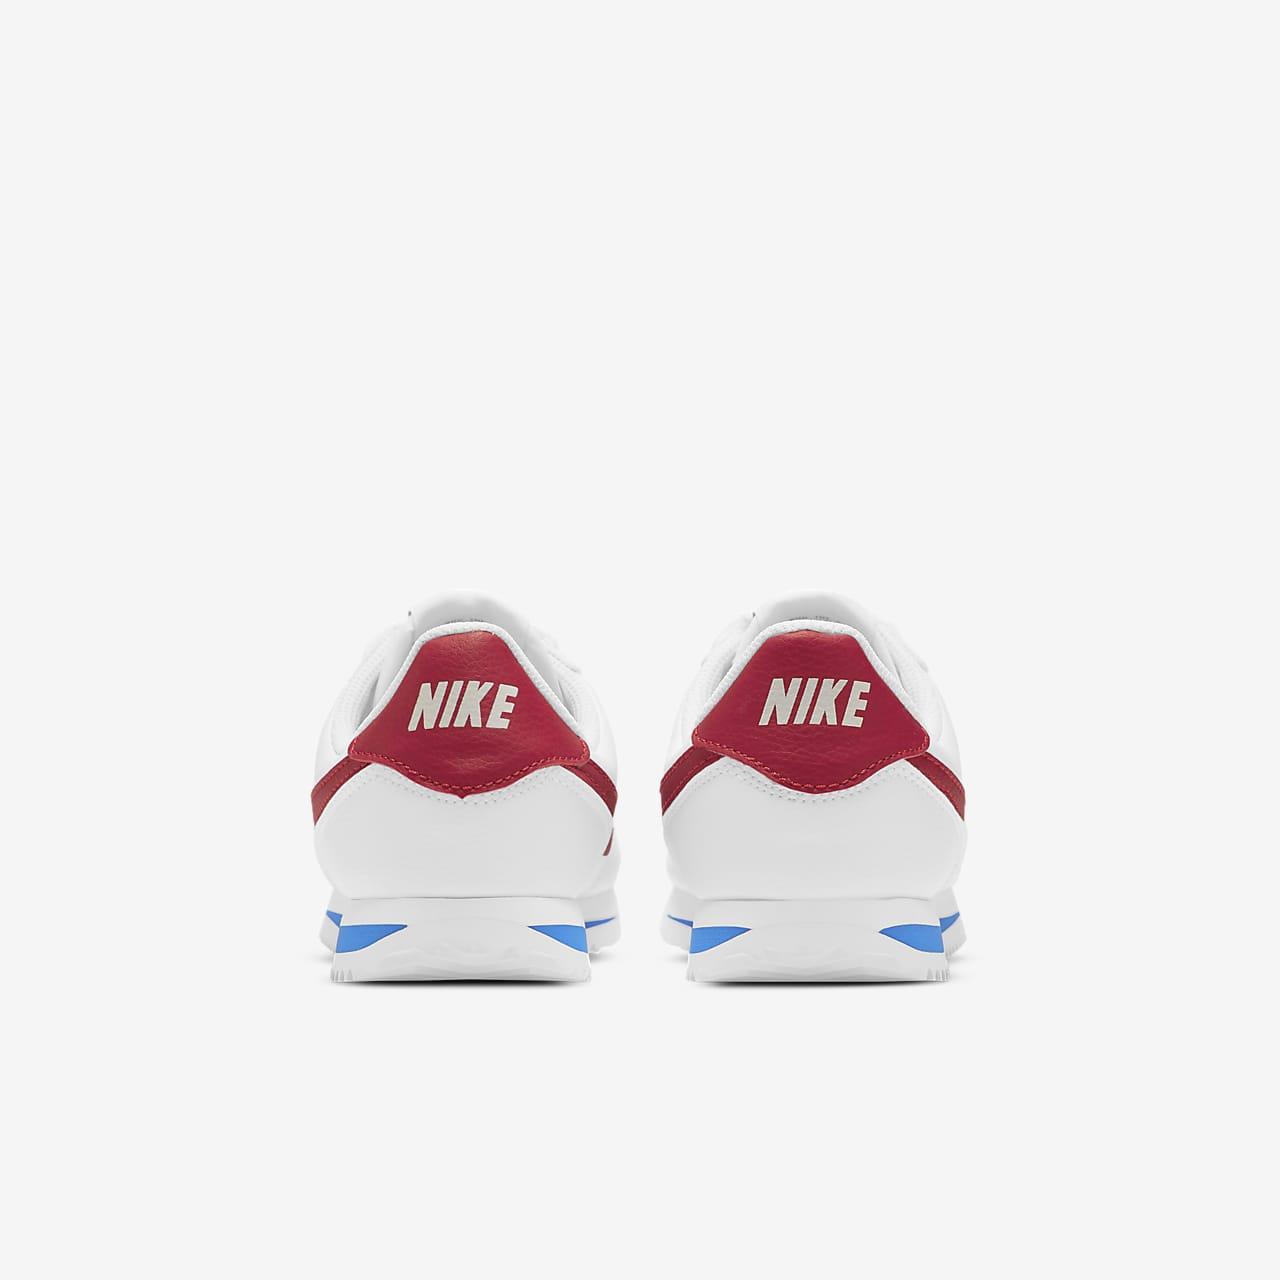 a5847a0184 Nike Cortez Basic SL Older Kids' Shoe. Nike.com GB